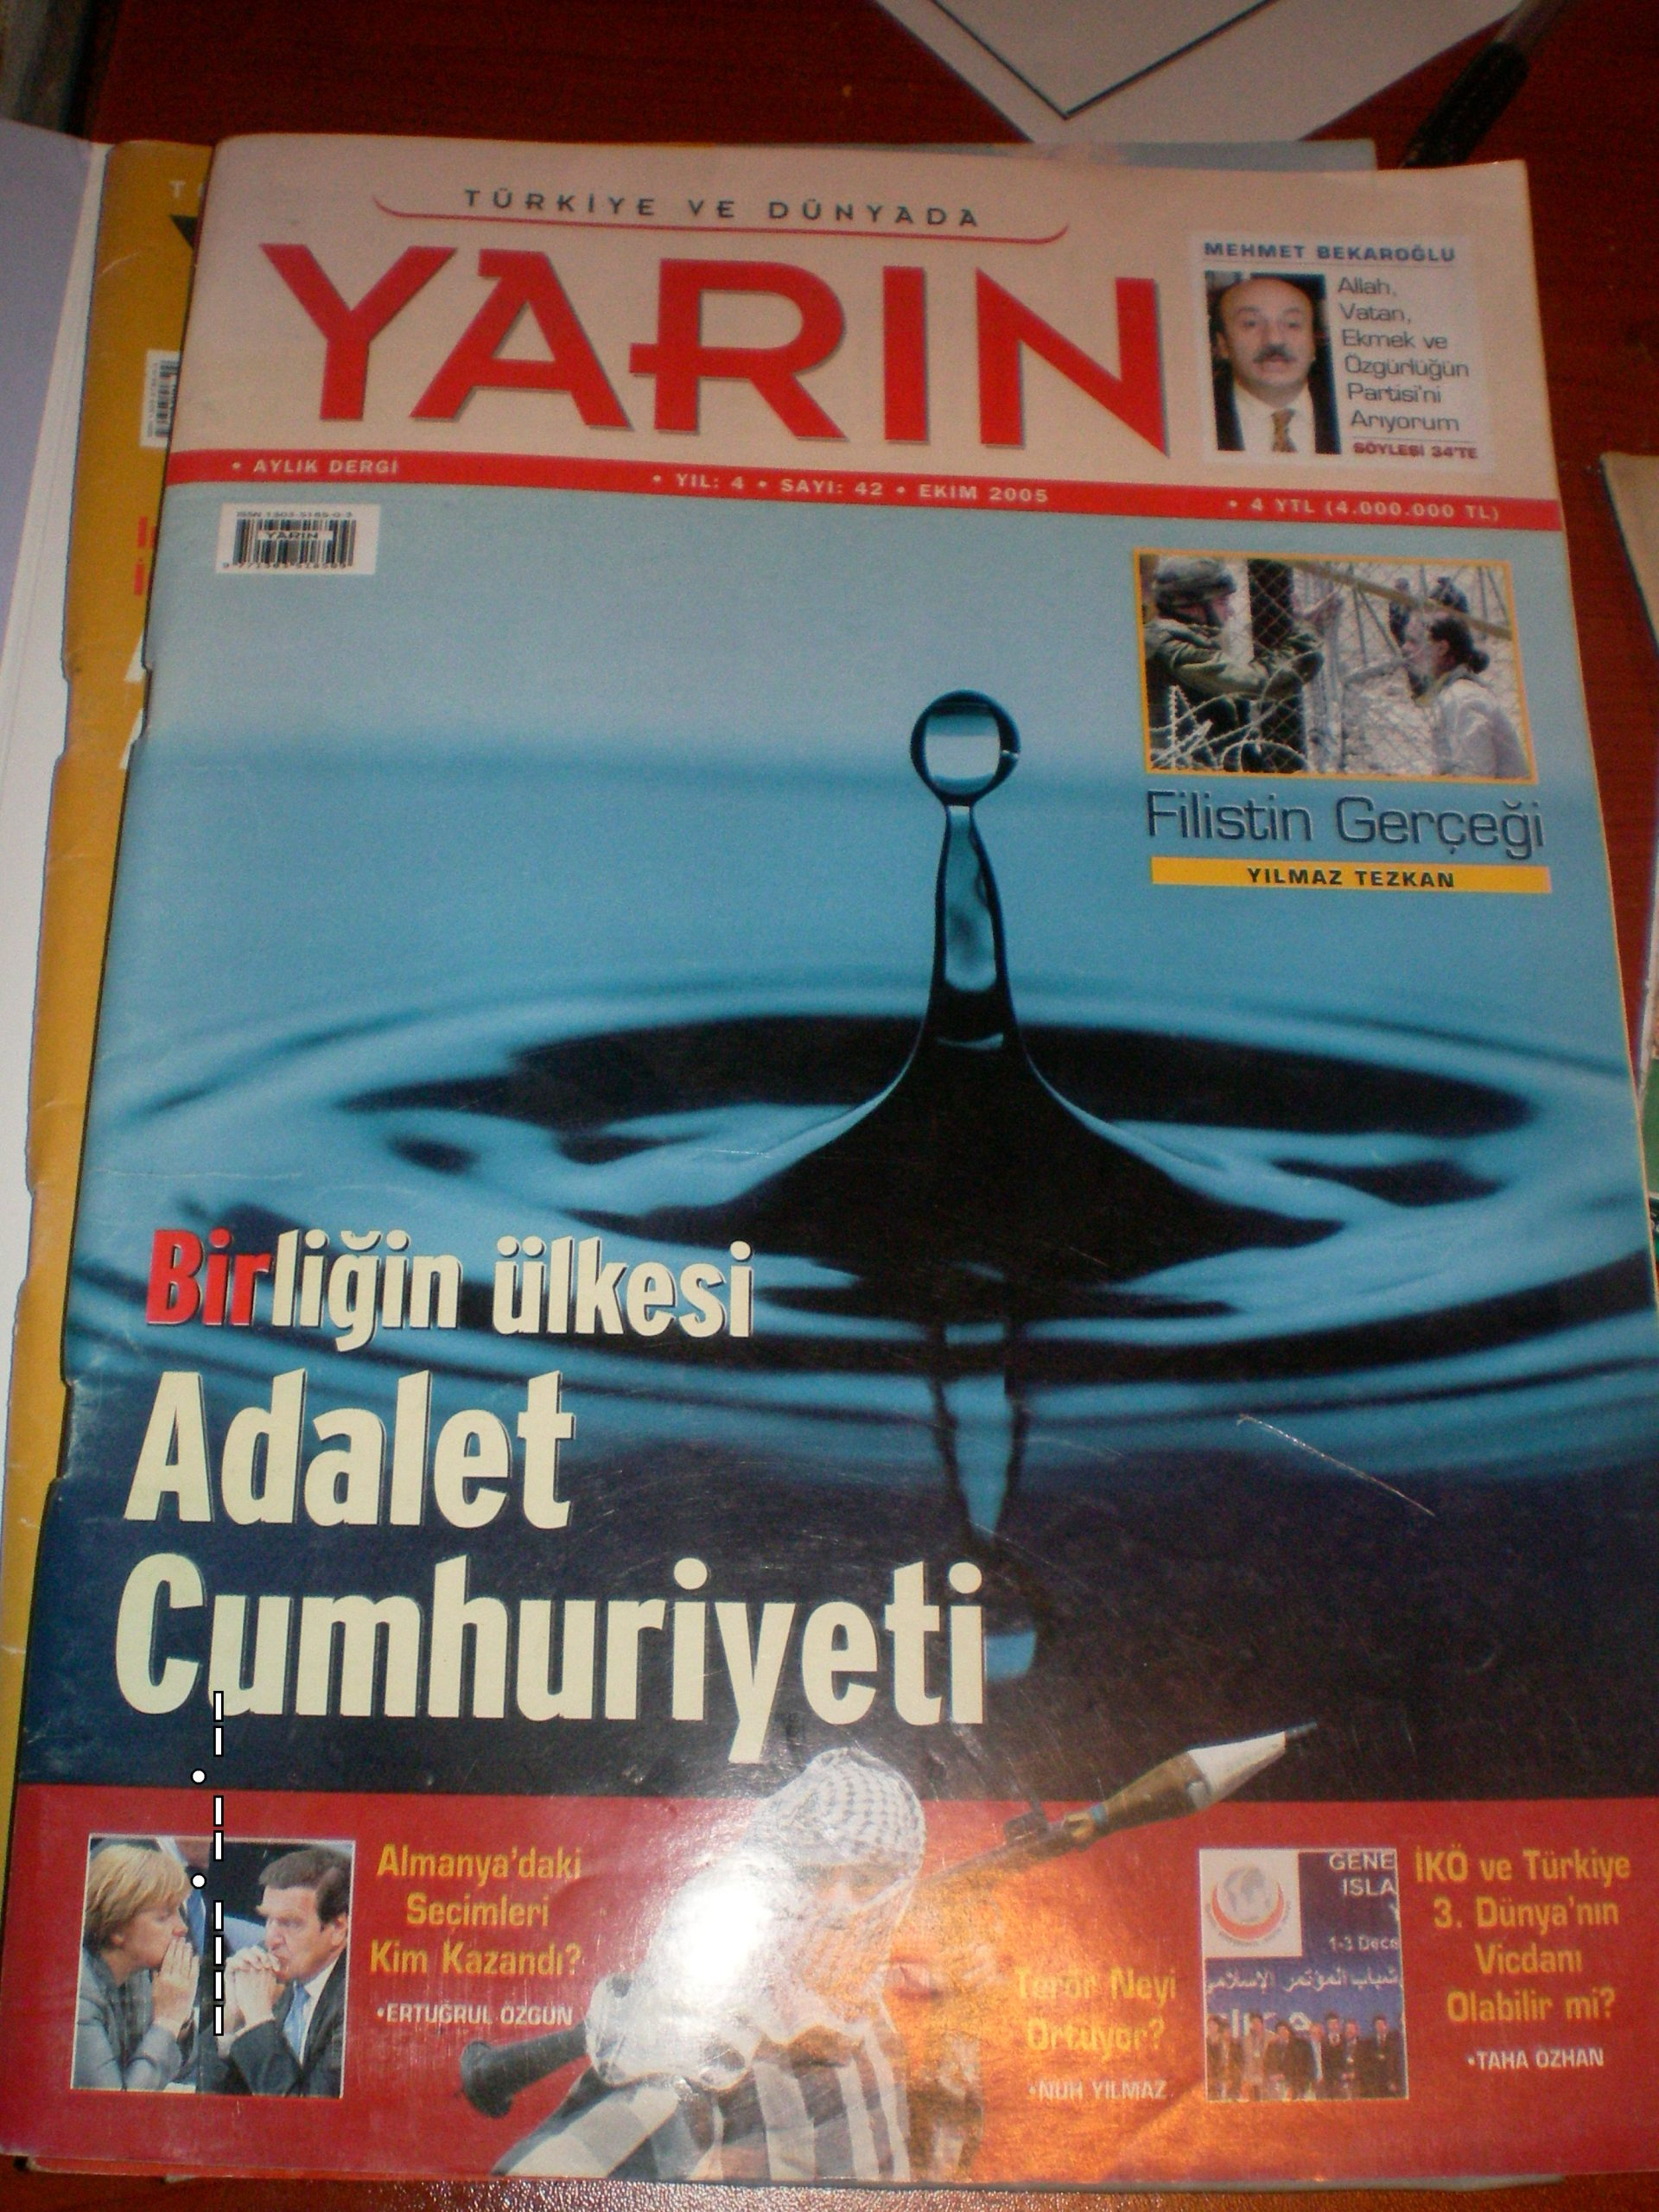 YARIN DERGİSİ/2005-2006/ 3 ADET/ toplam 15TL